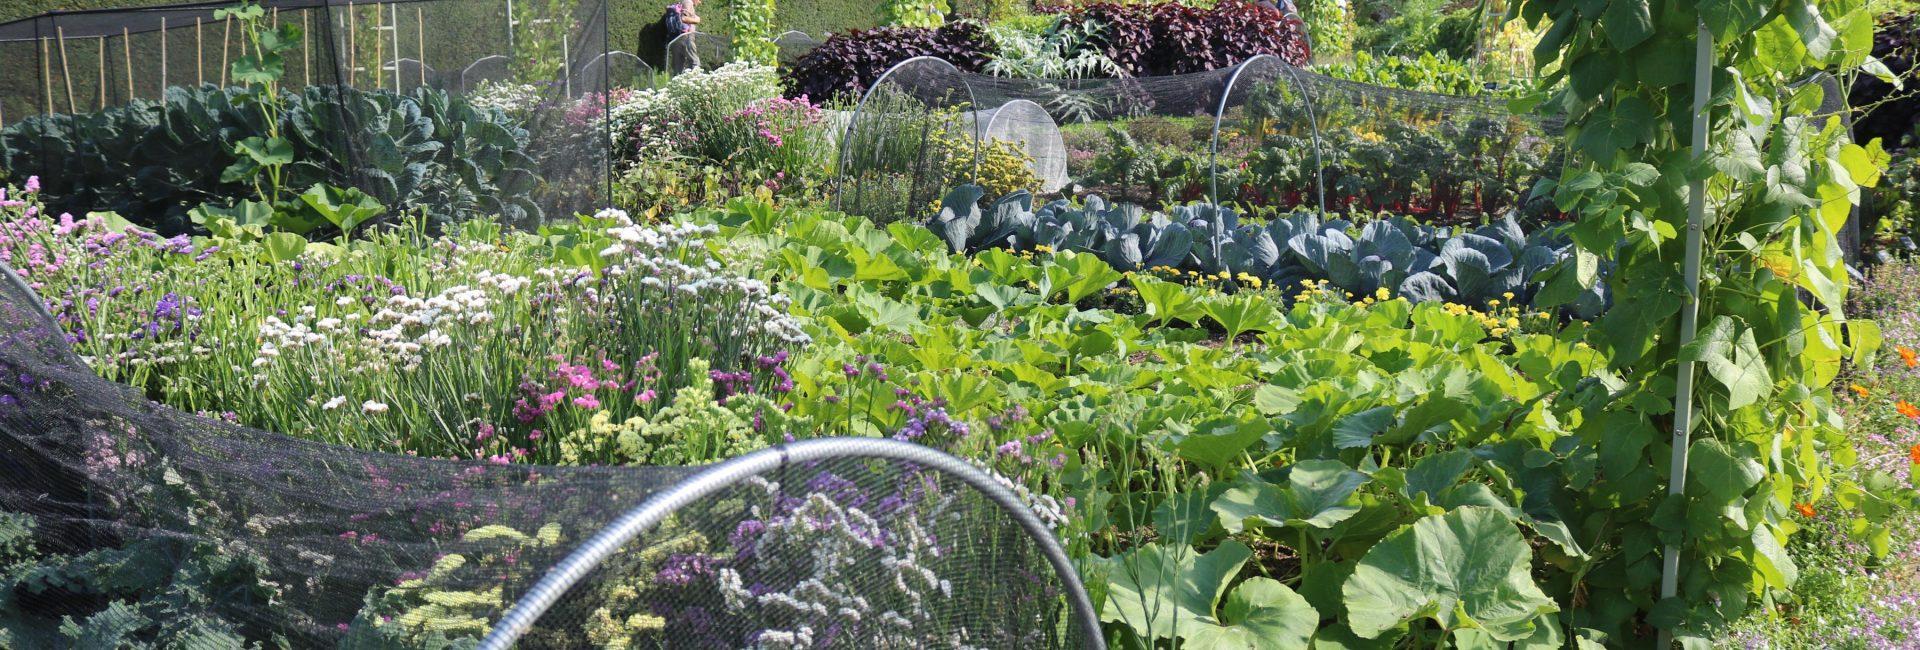 RHS Wisley and my dream garden!